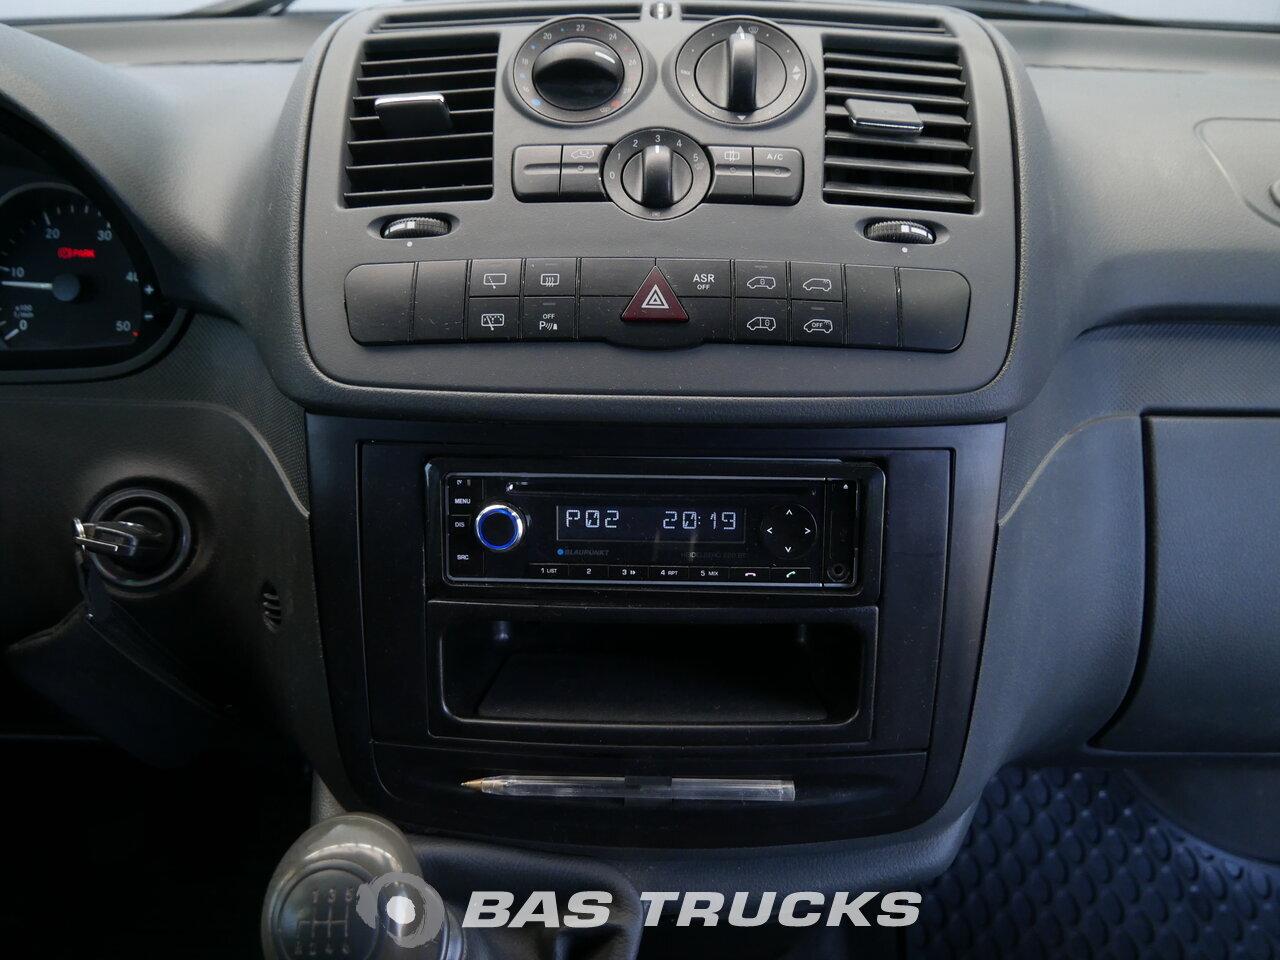 Mercedes Vito Light Commercial Vehicle 10400 Bas Trucks